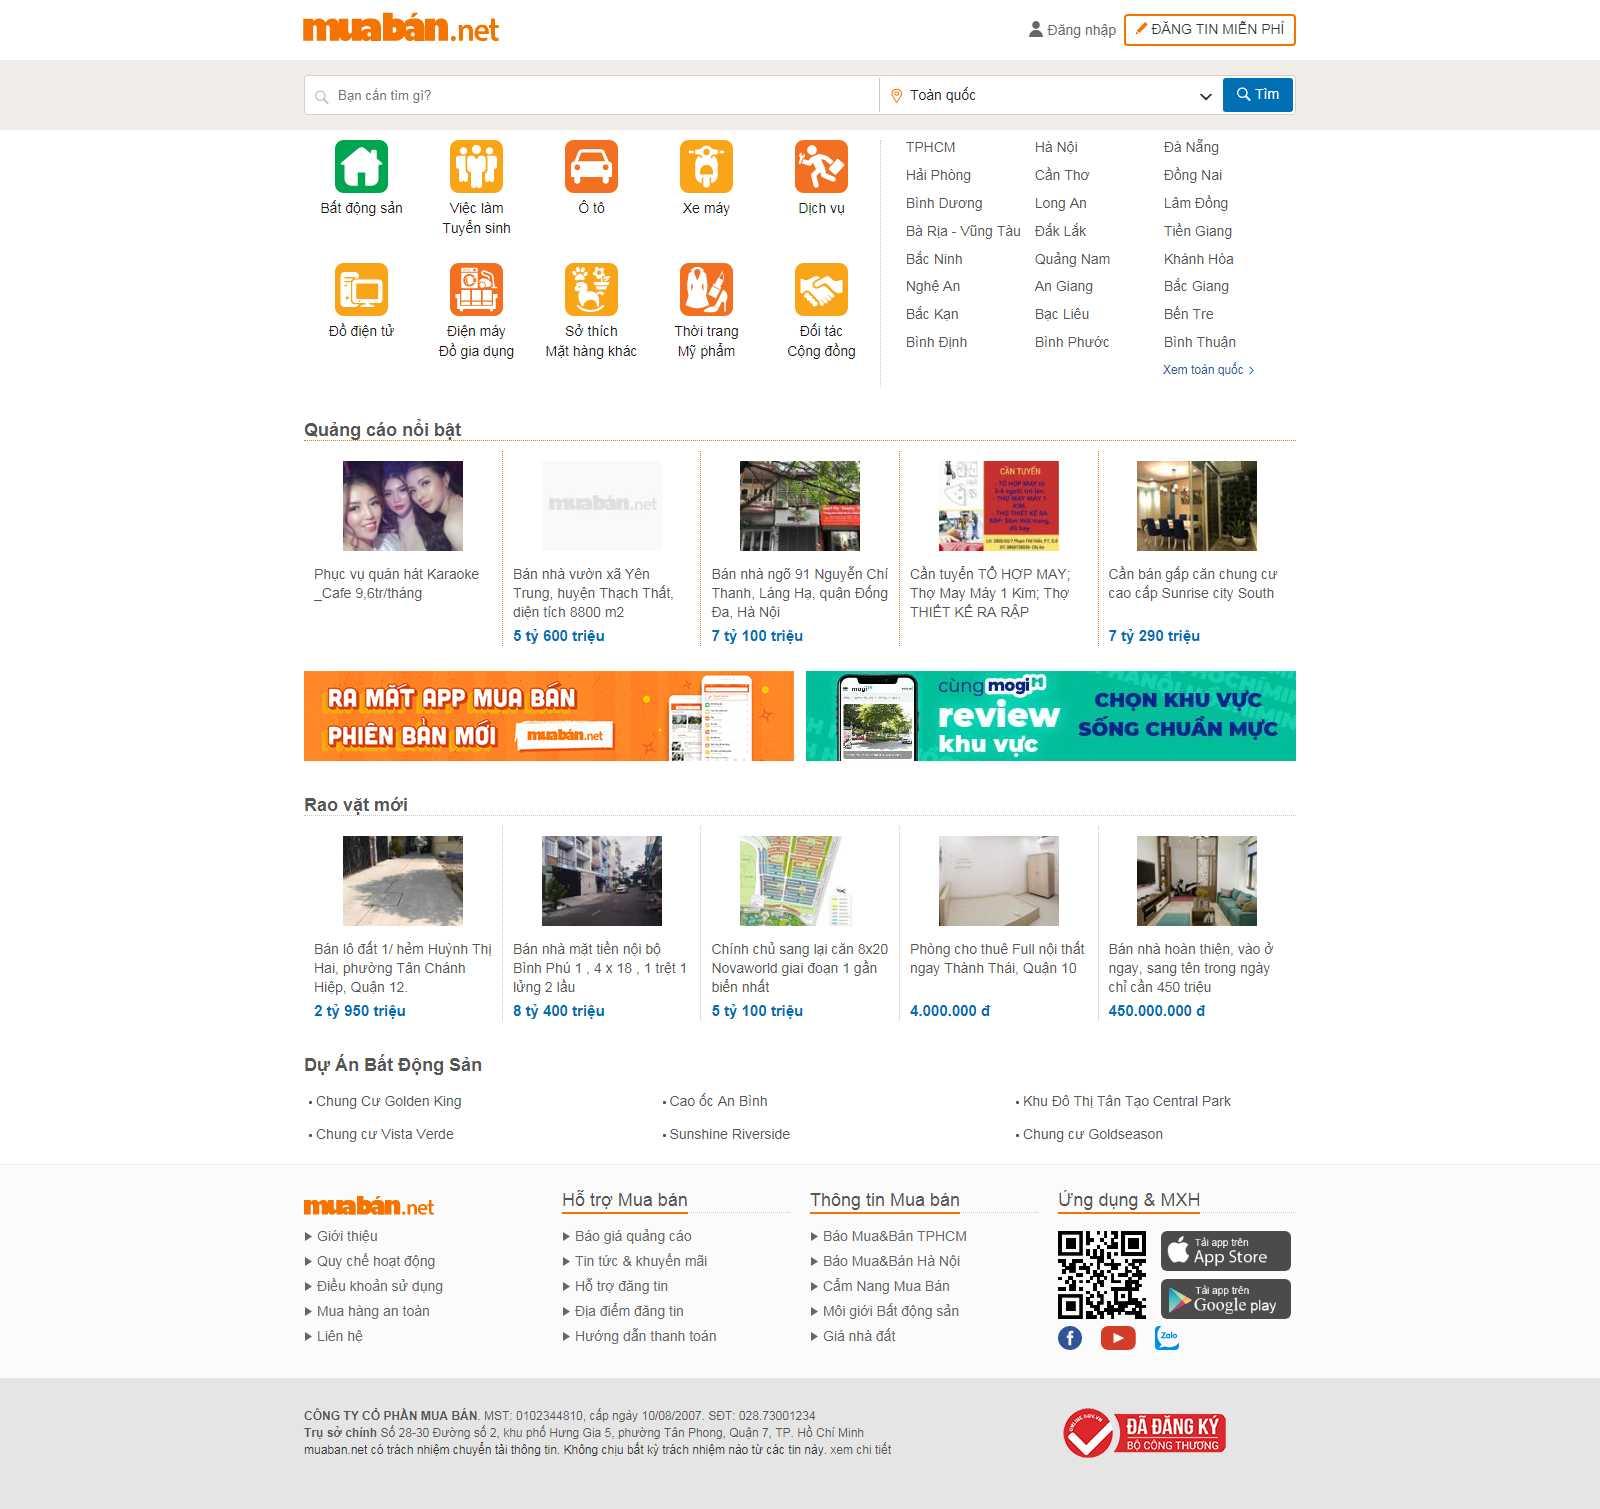 Thiết kế Web chợ online - muaban.net